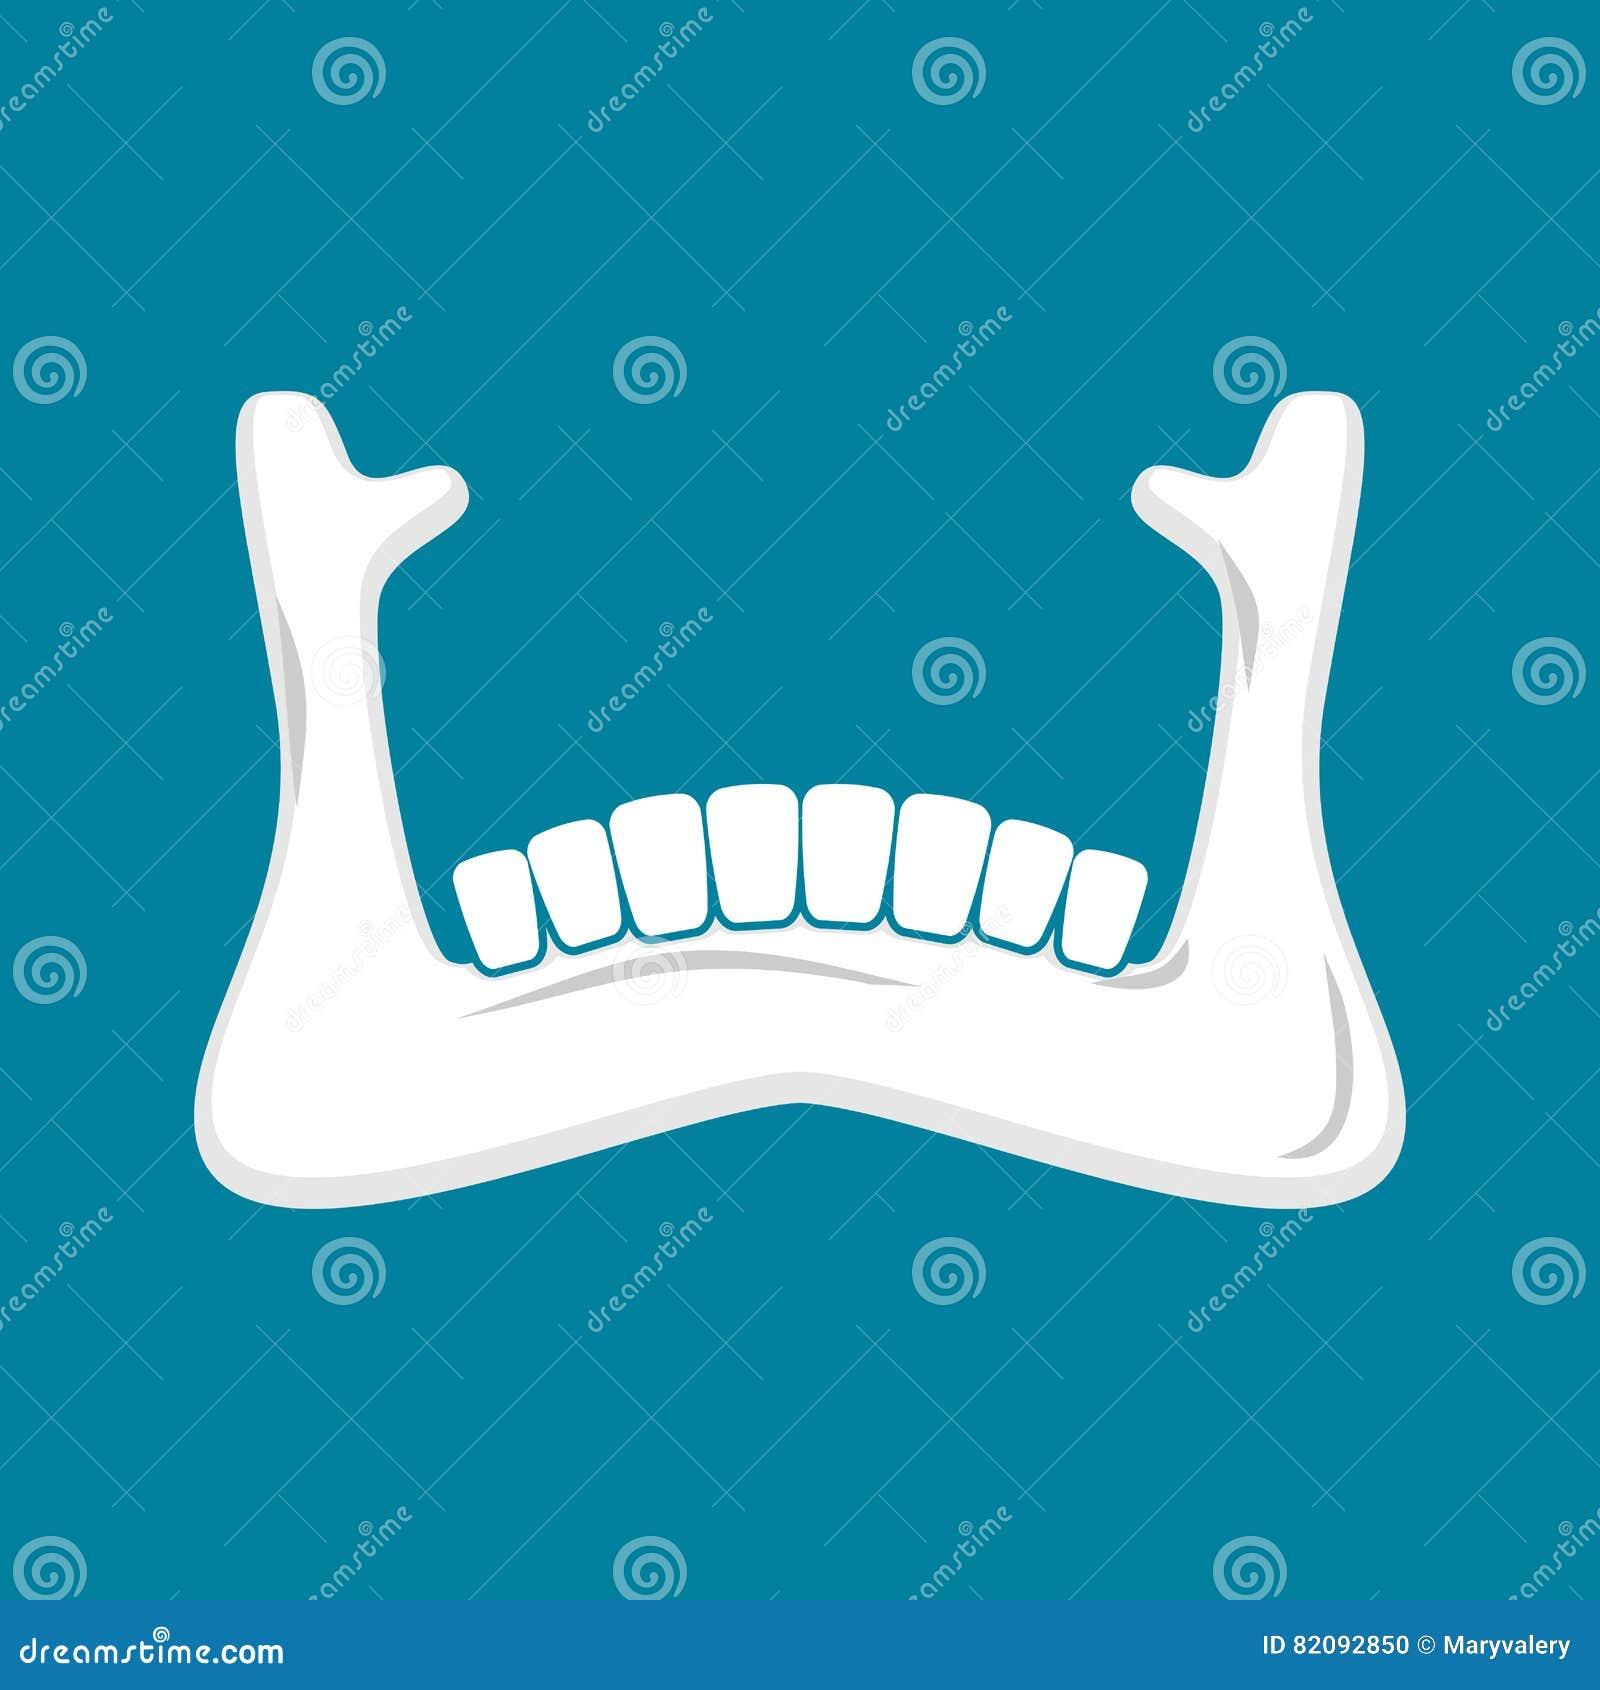 Mandible Human Lower Jaw Anatomy Of Bone Part Of Sku Stock